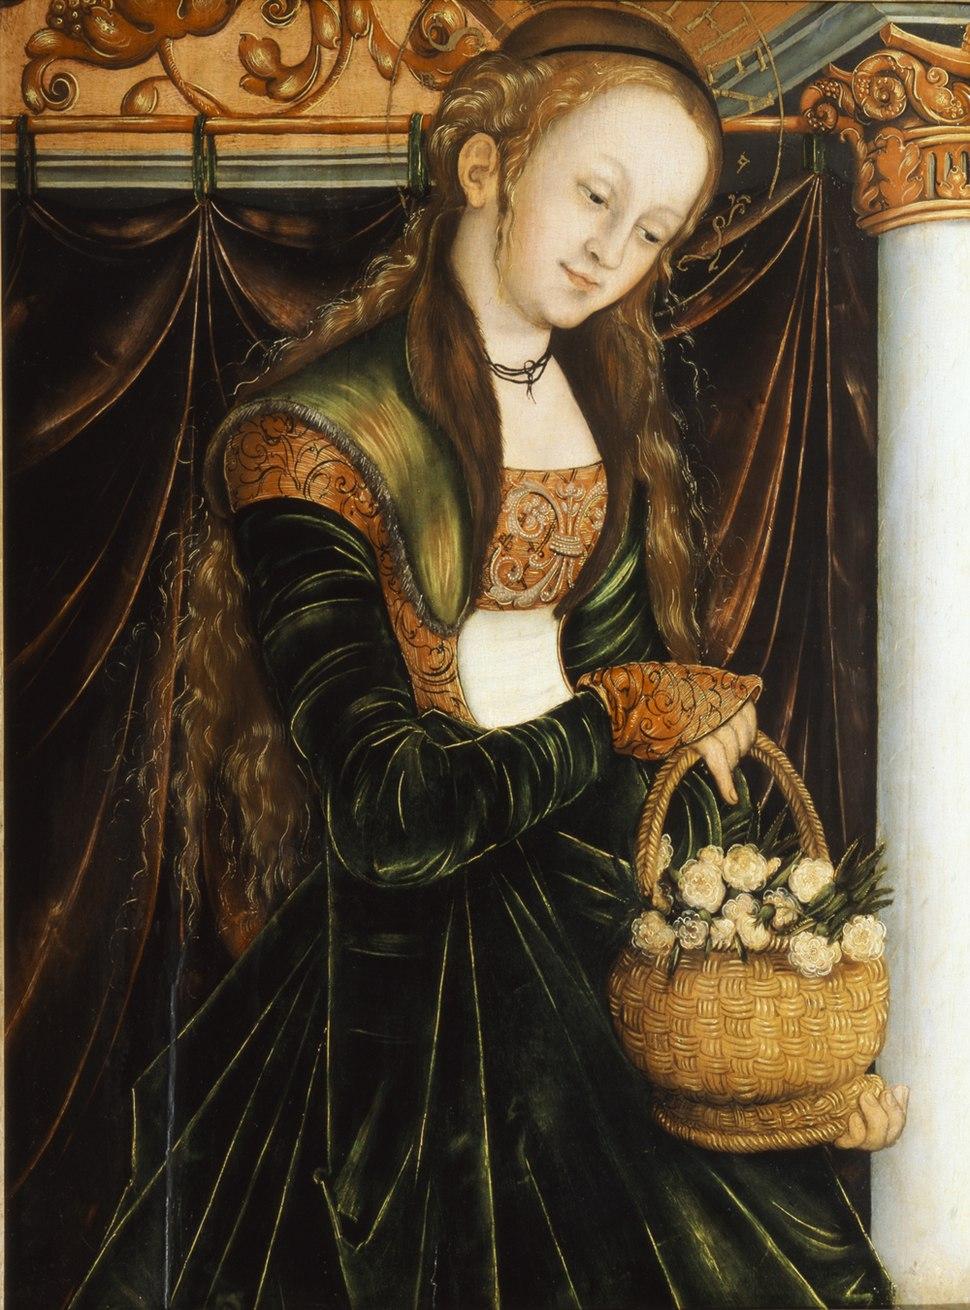 Cranach, Lucas, d.%C3%84. - Die Heilige Dorothea - c. 1530.jpg